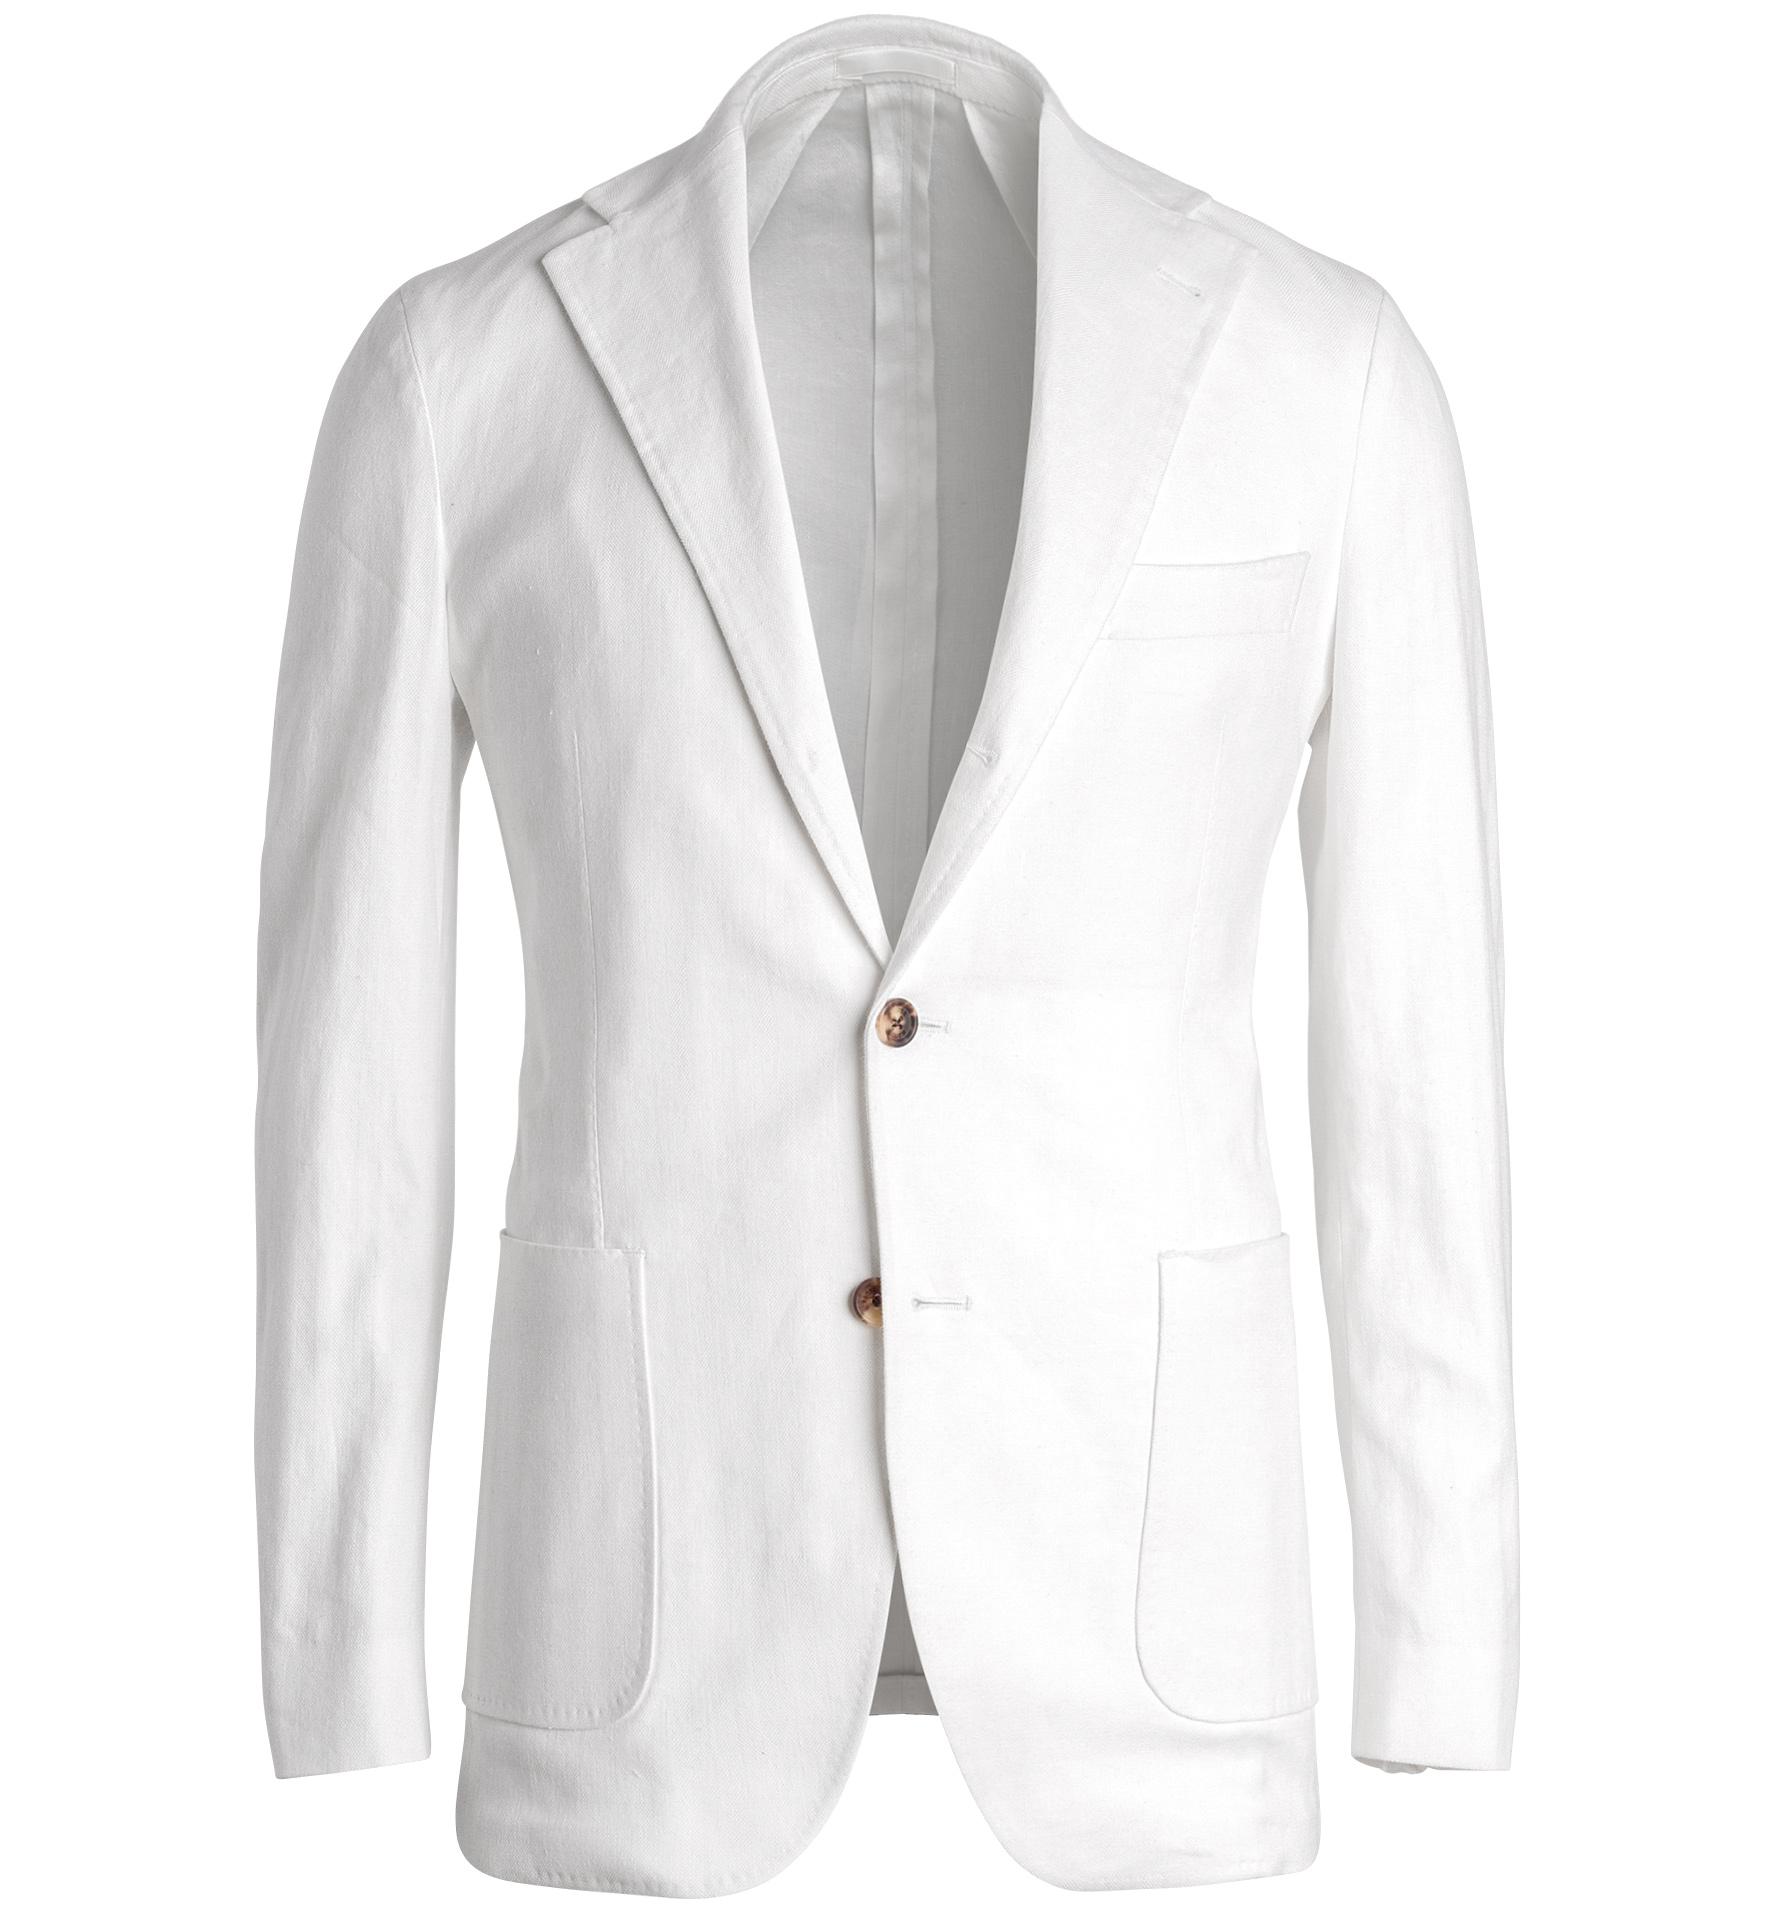 Zoom Image of Waverly White Cotton and Linen Stretch Herringbone Jacket